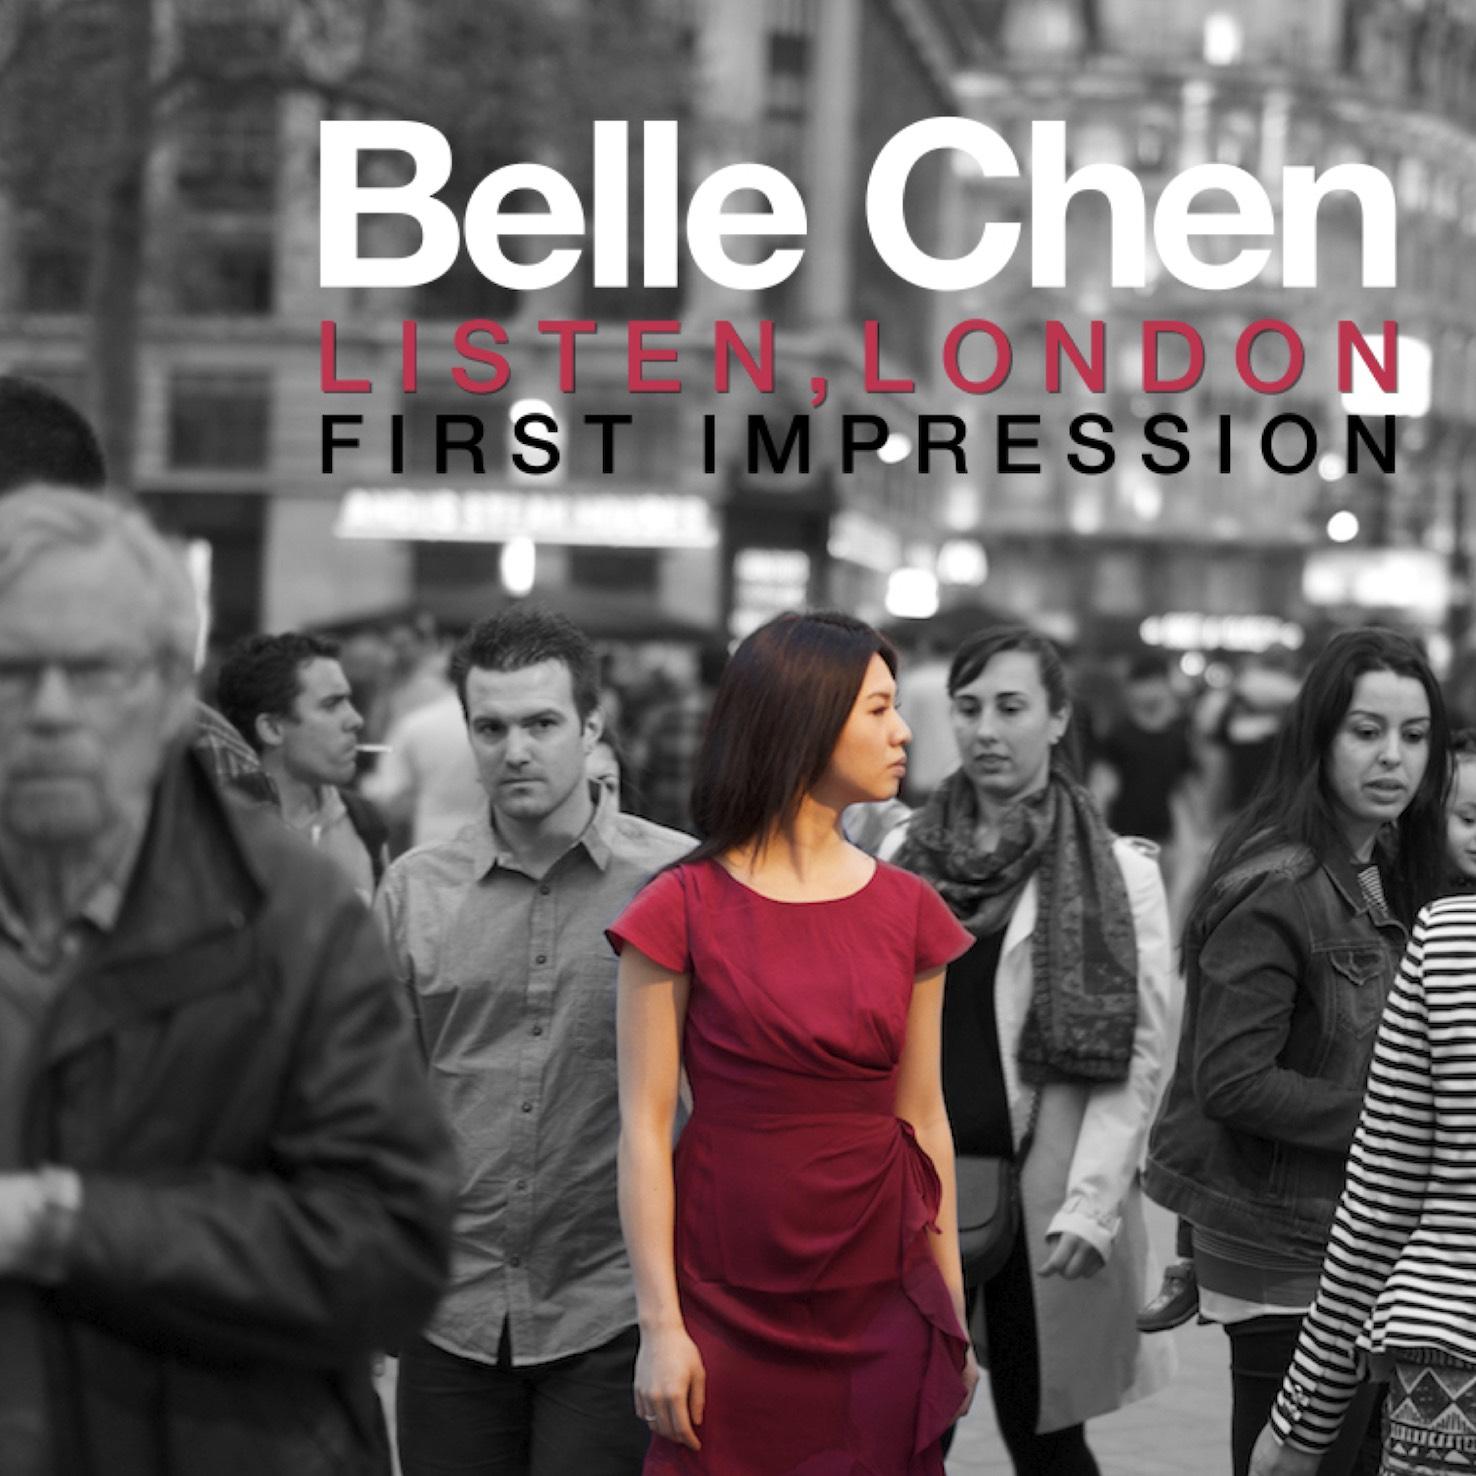 Listen, London: First Impression